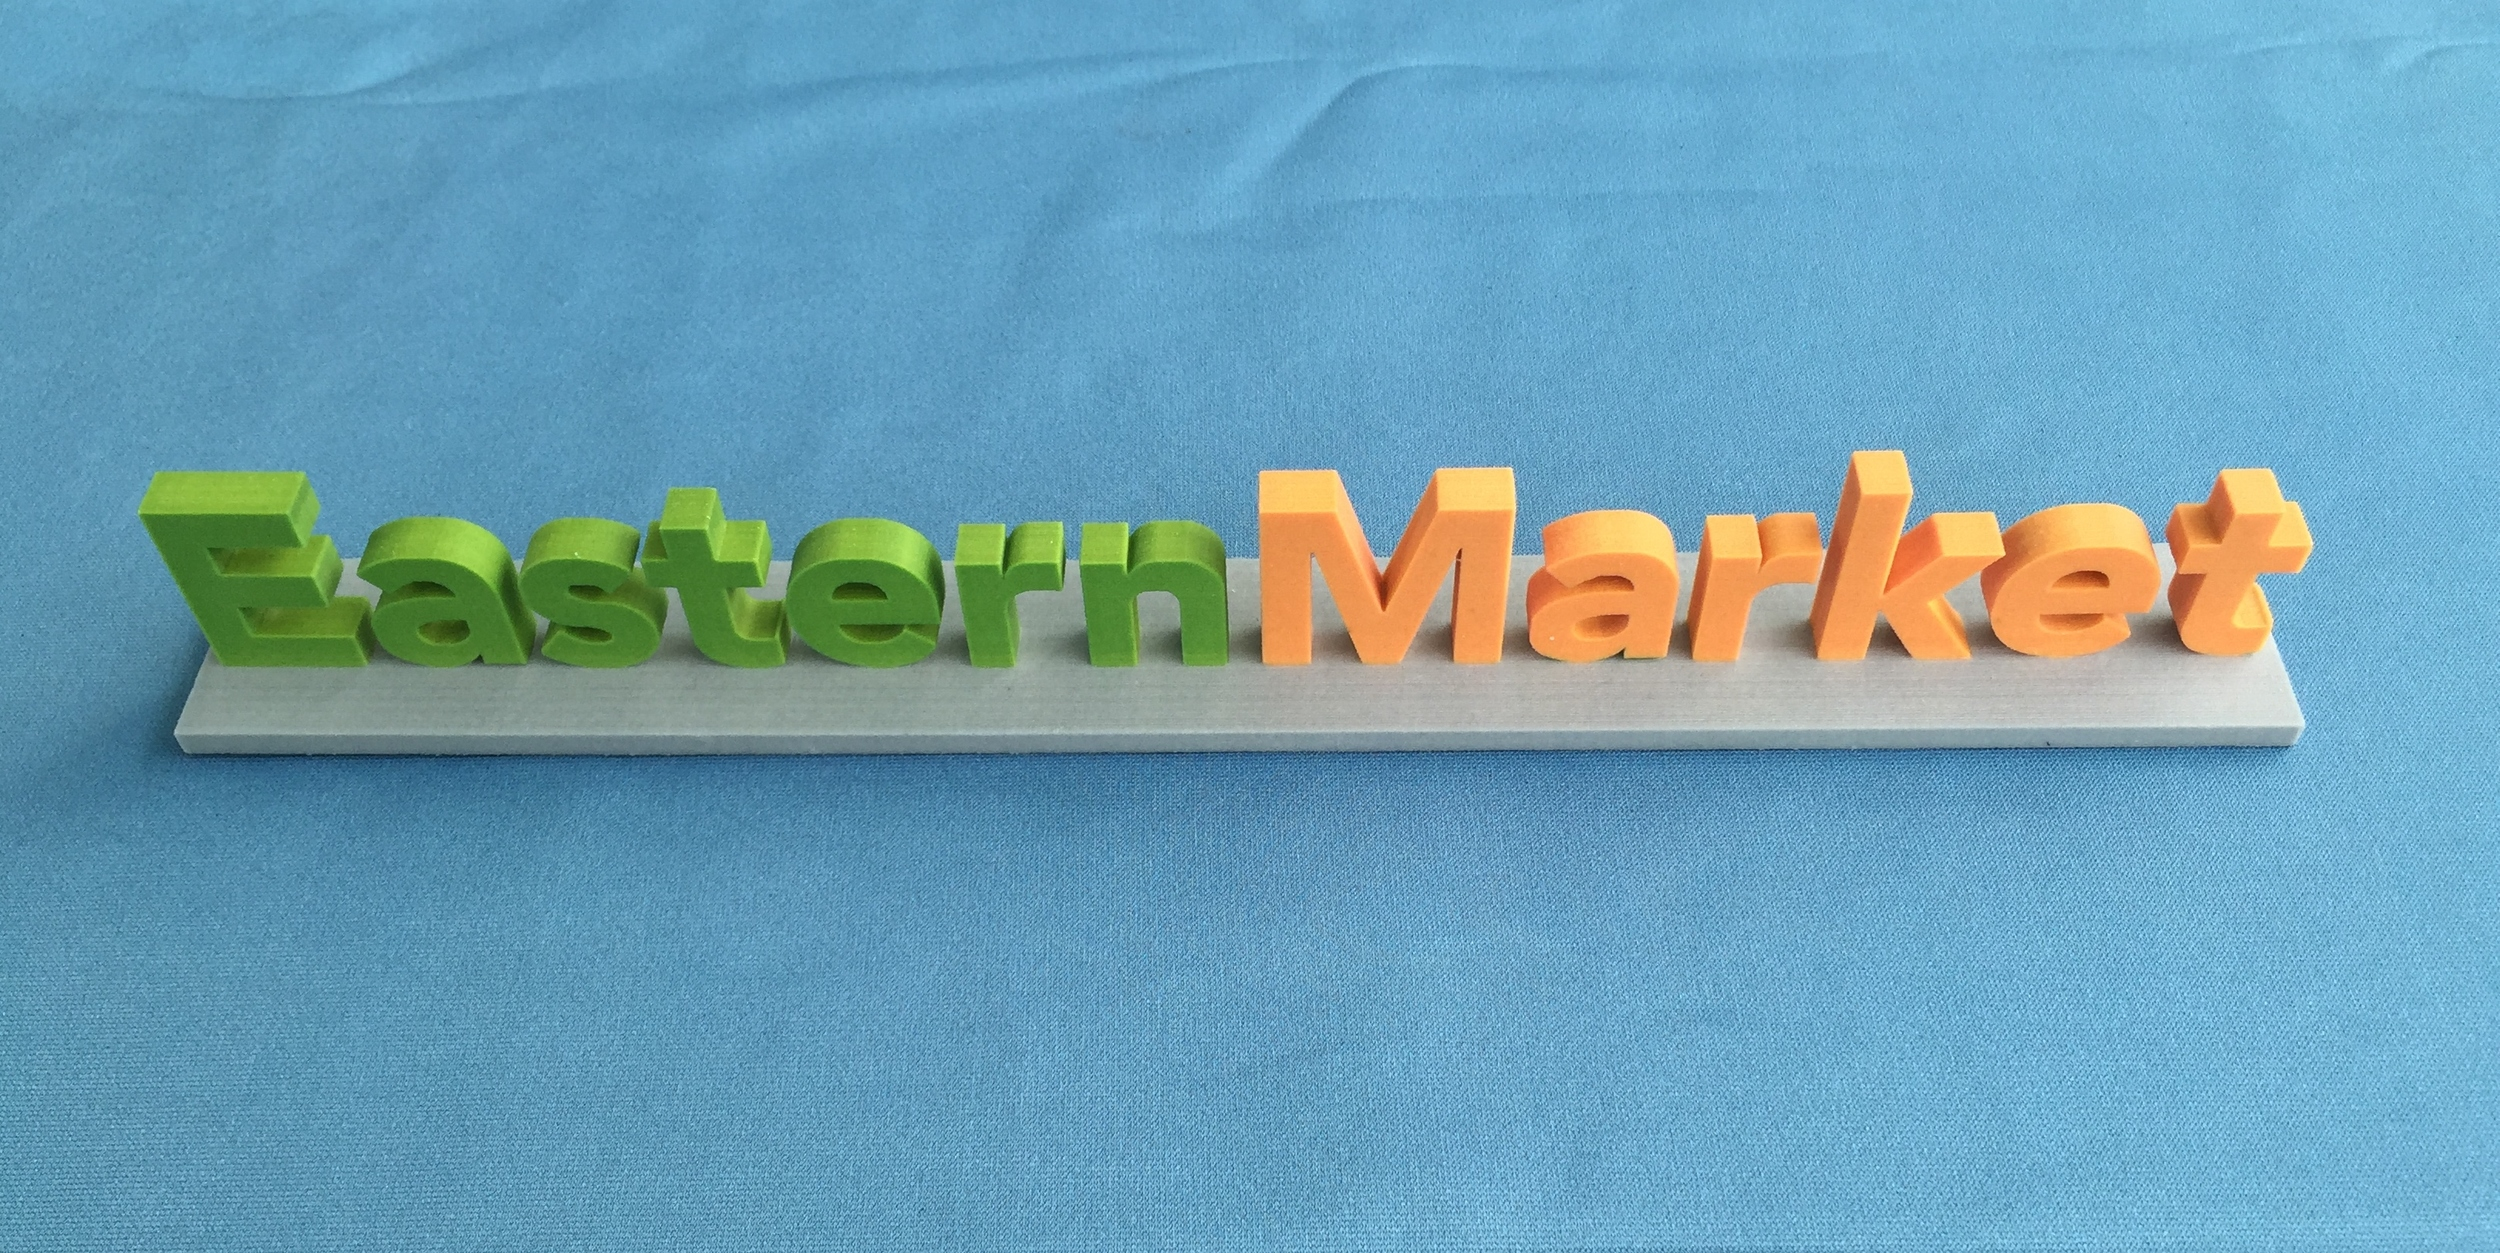 Eastern Market Letters 3 D Printed in Color 10 6 15.JPG